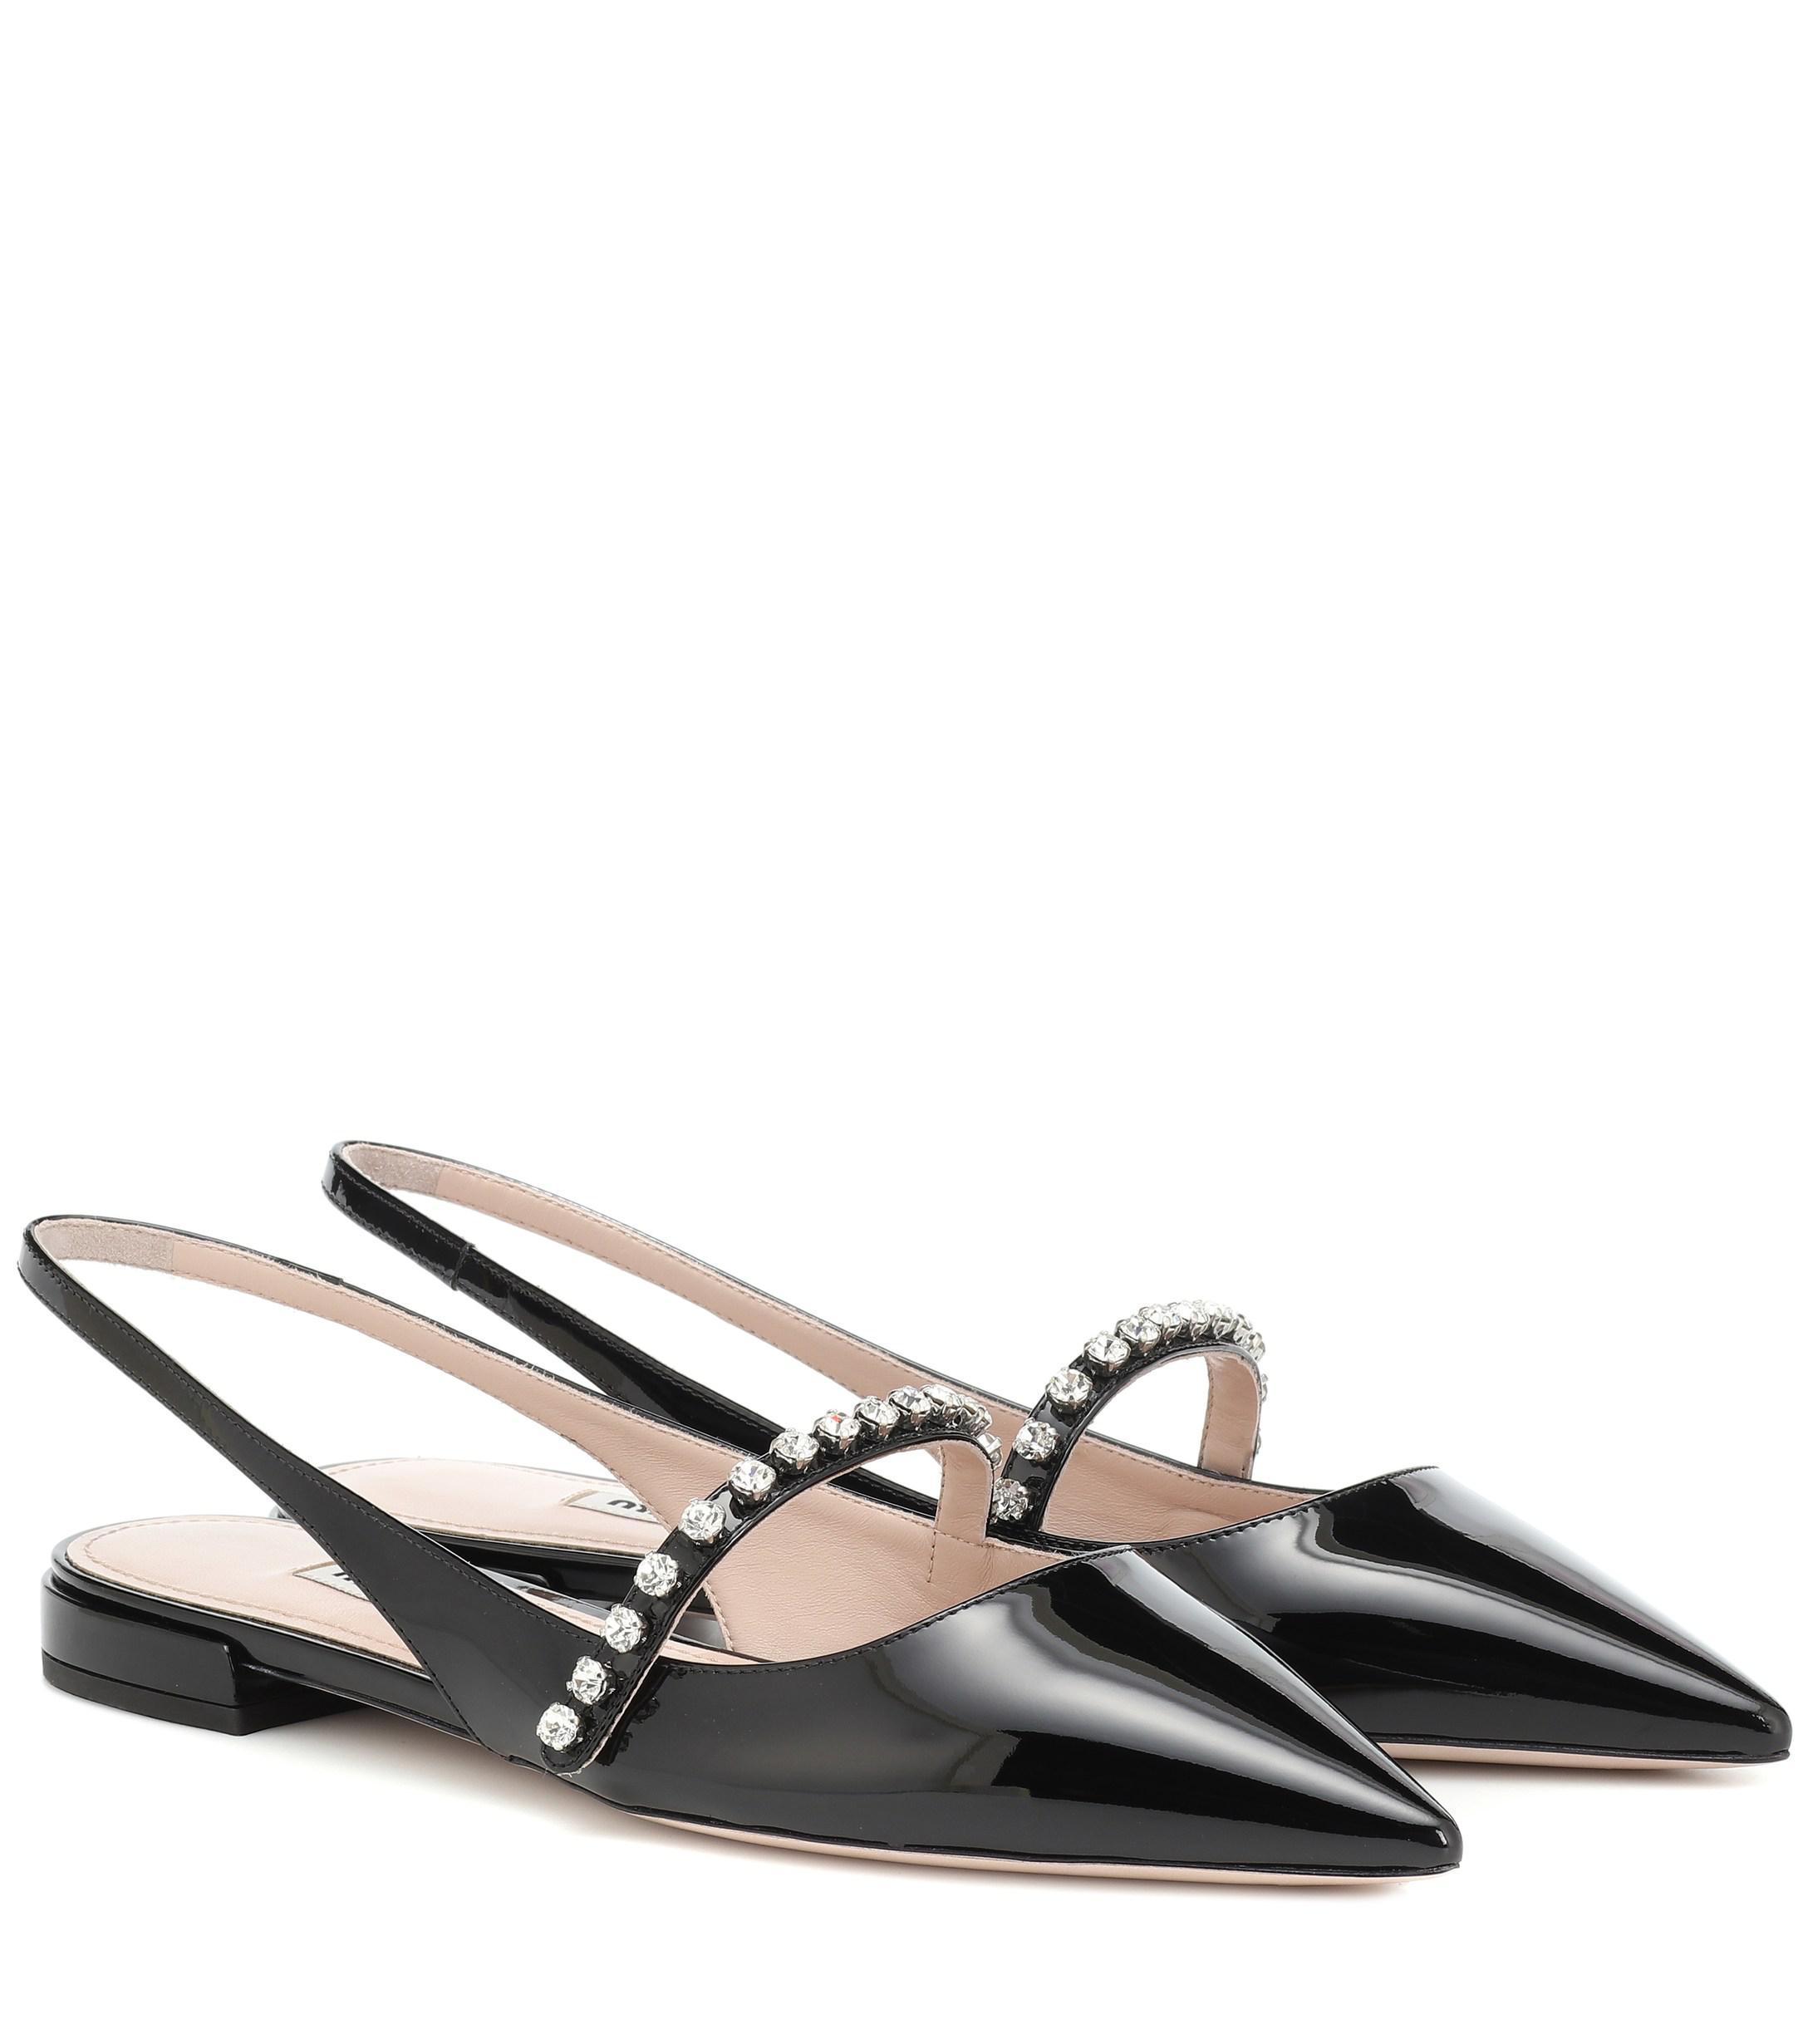 81741c13b5c5 Miu Miu. Women s Black Crystal-embellished Ballet Flats.  750 From  Mytheresa. Free shipping ...